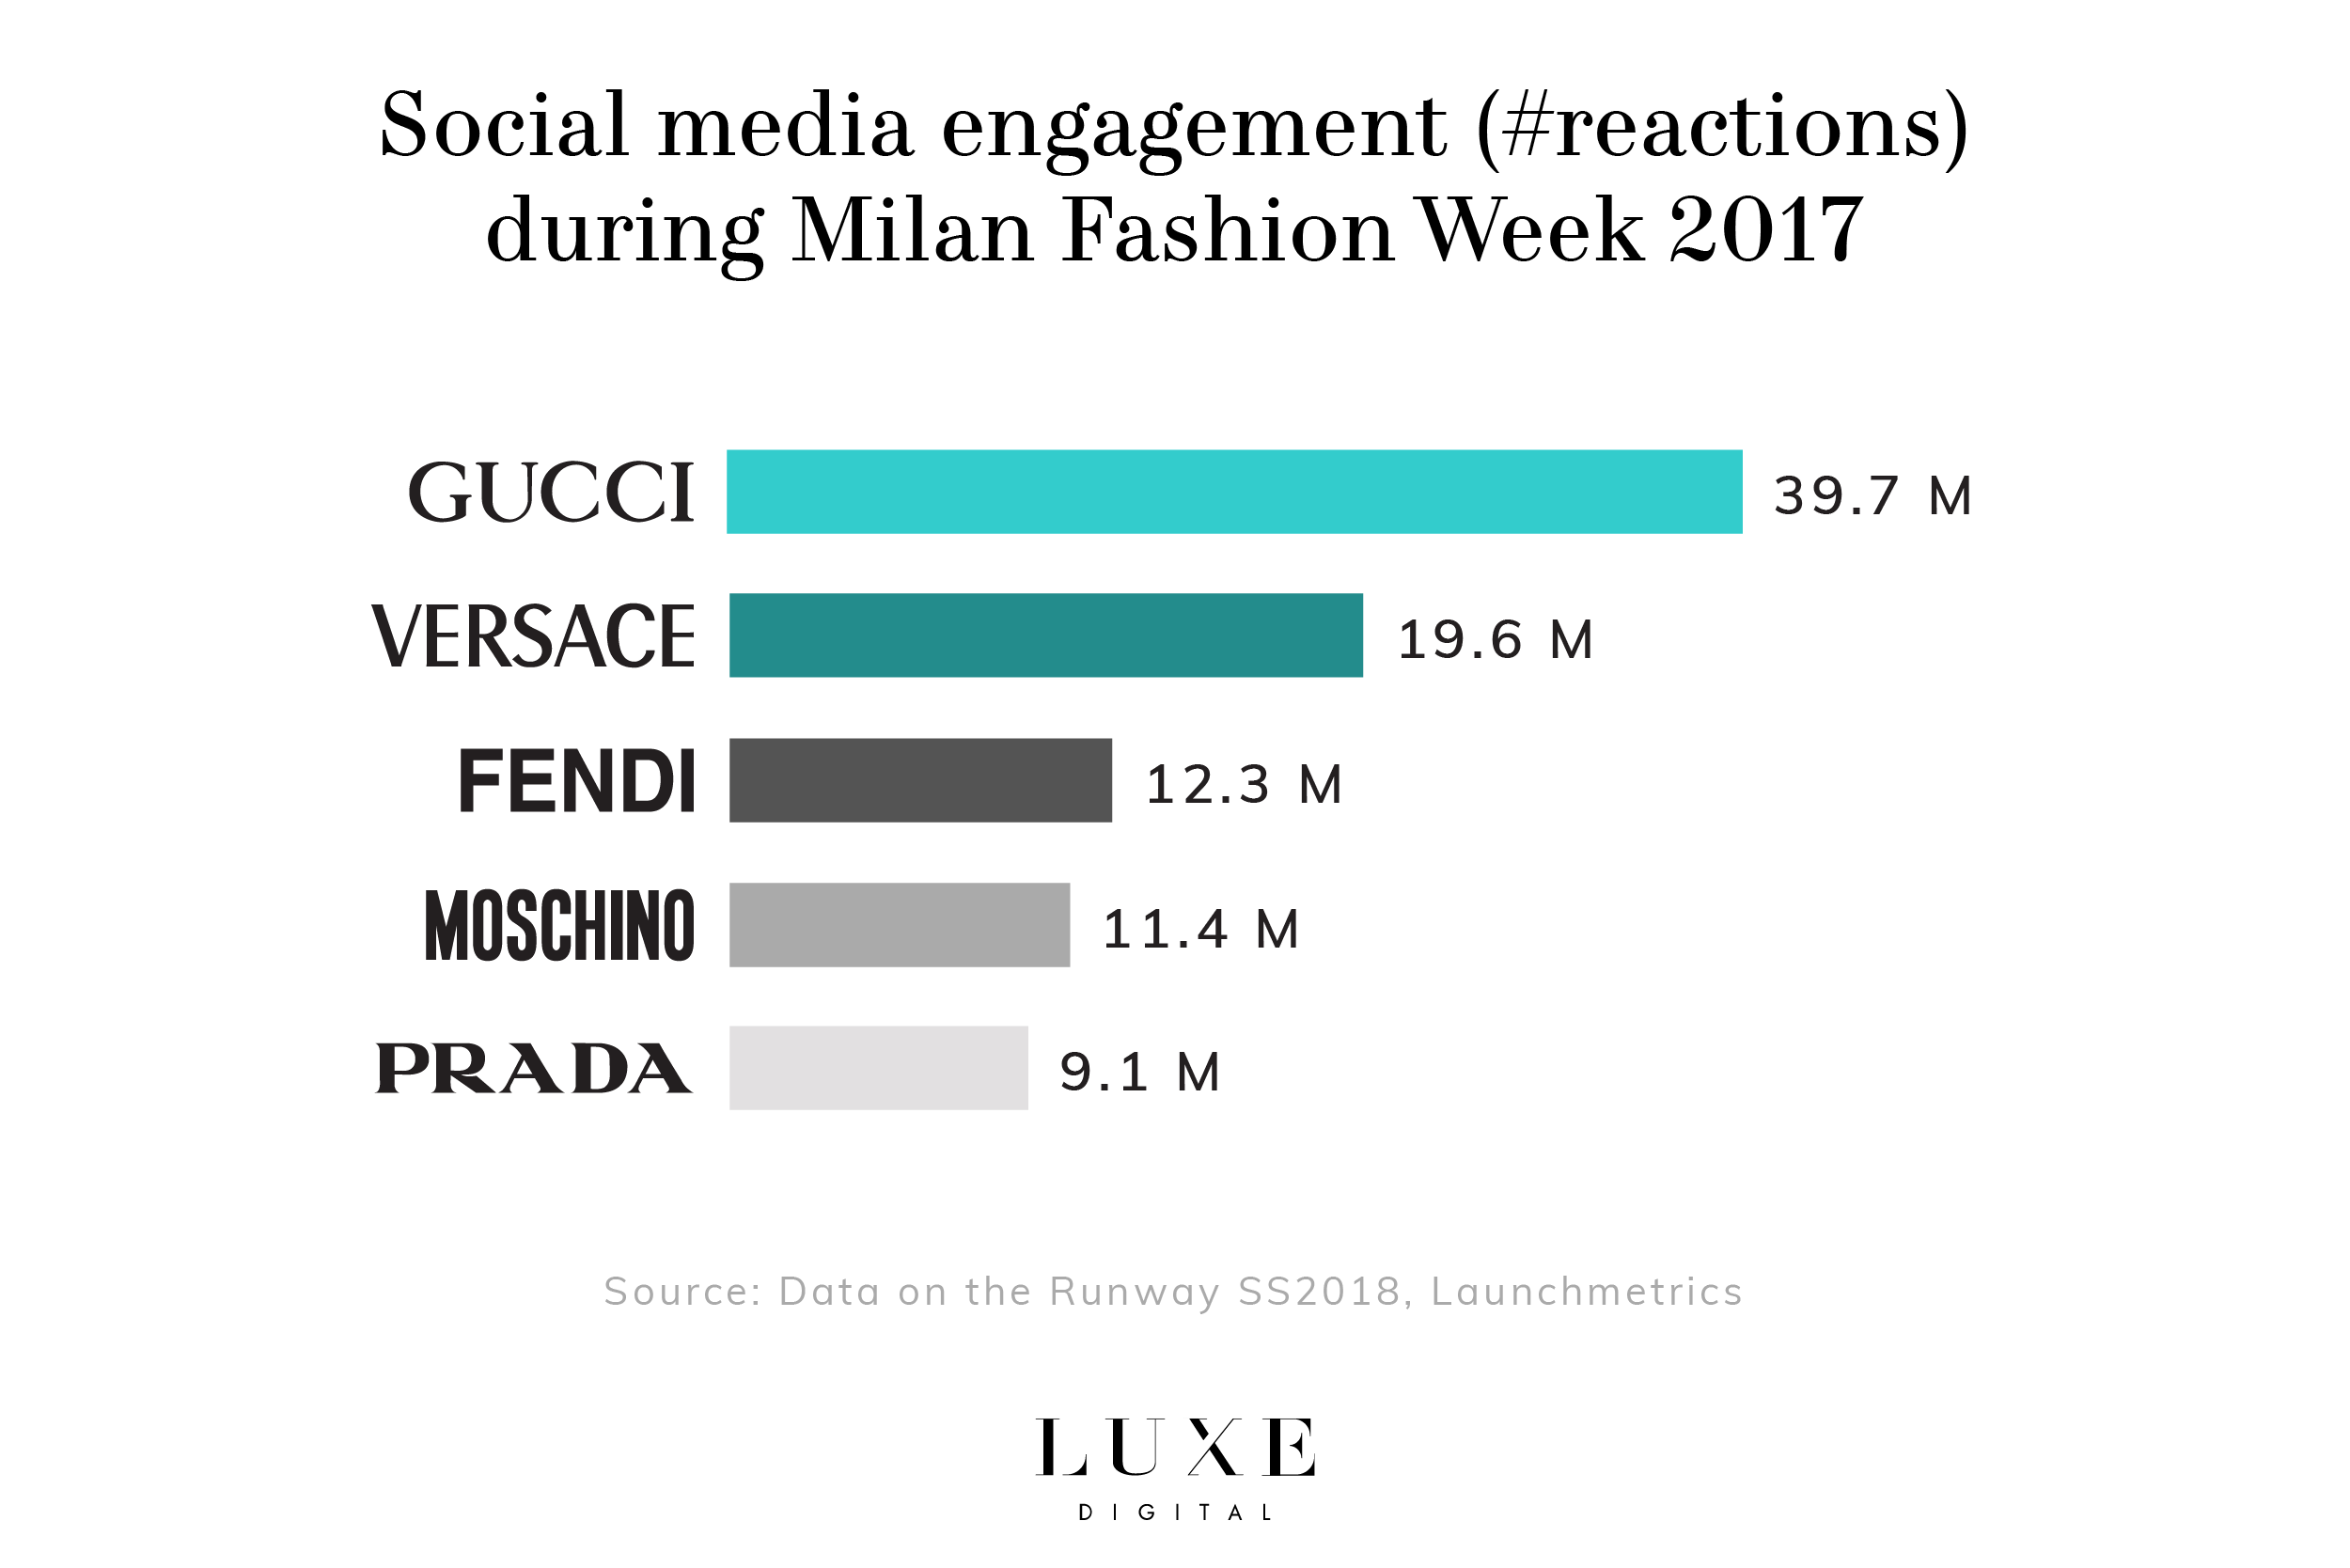 Social media engagement gucci milan fashion week luxe digital luxury fashion millennials